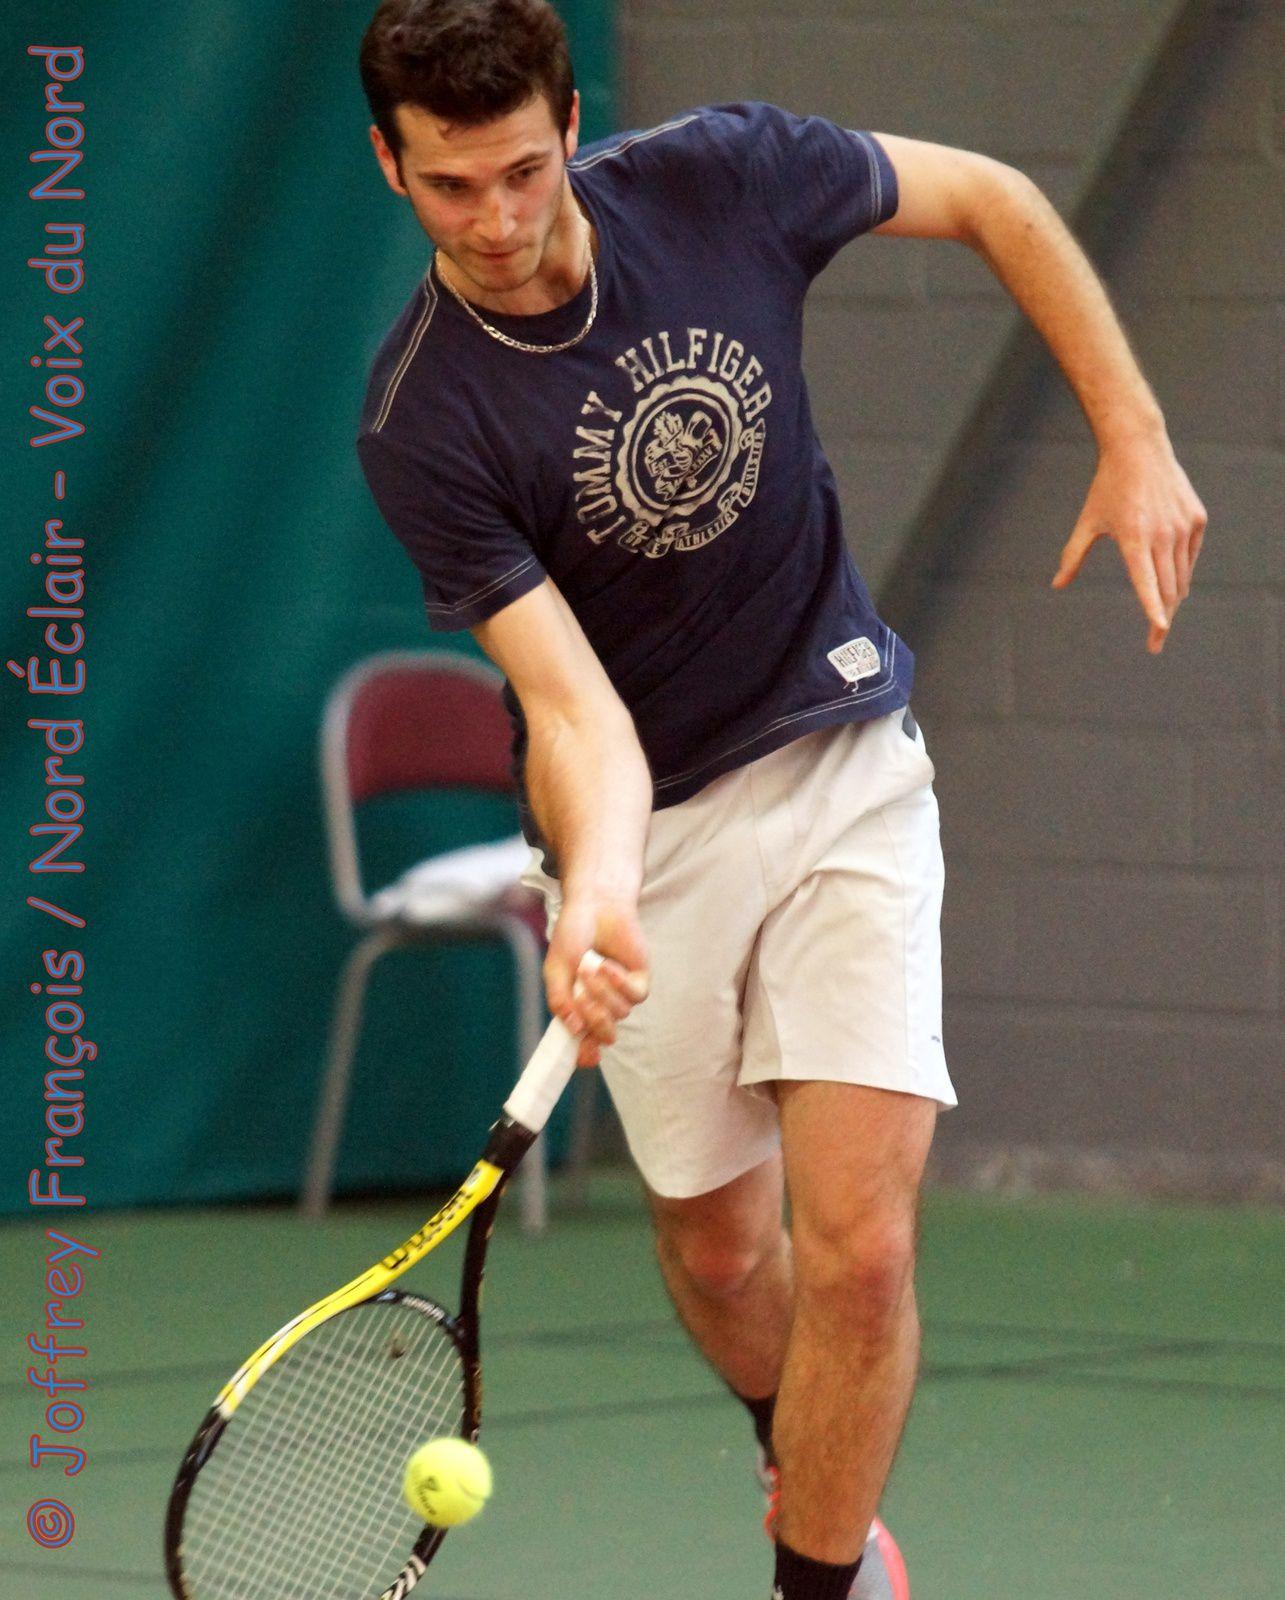 22/03/14 Tennis Comines